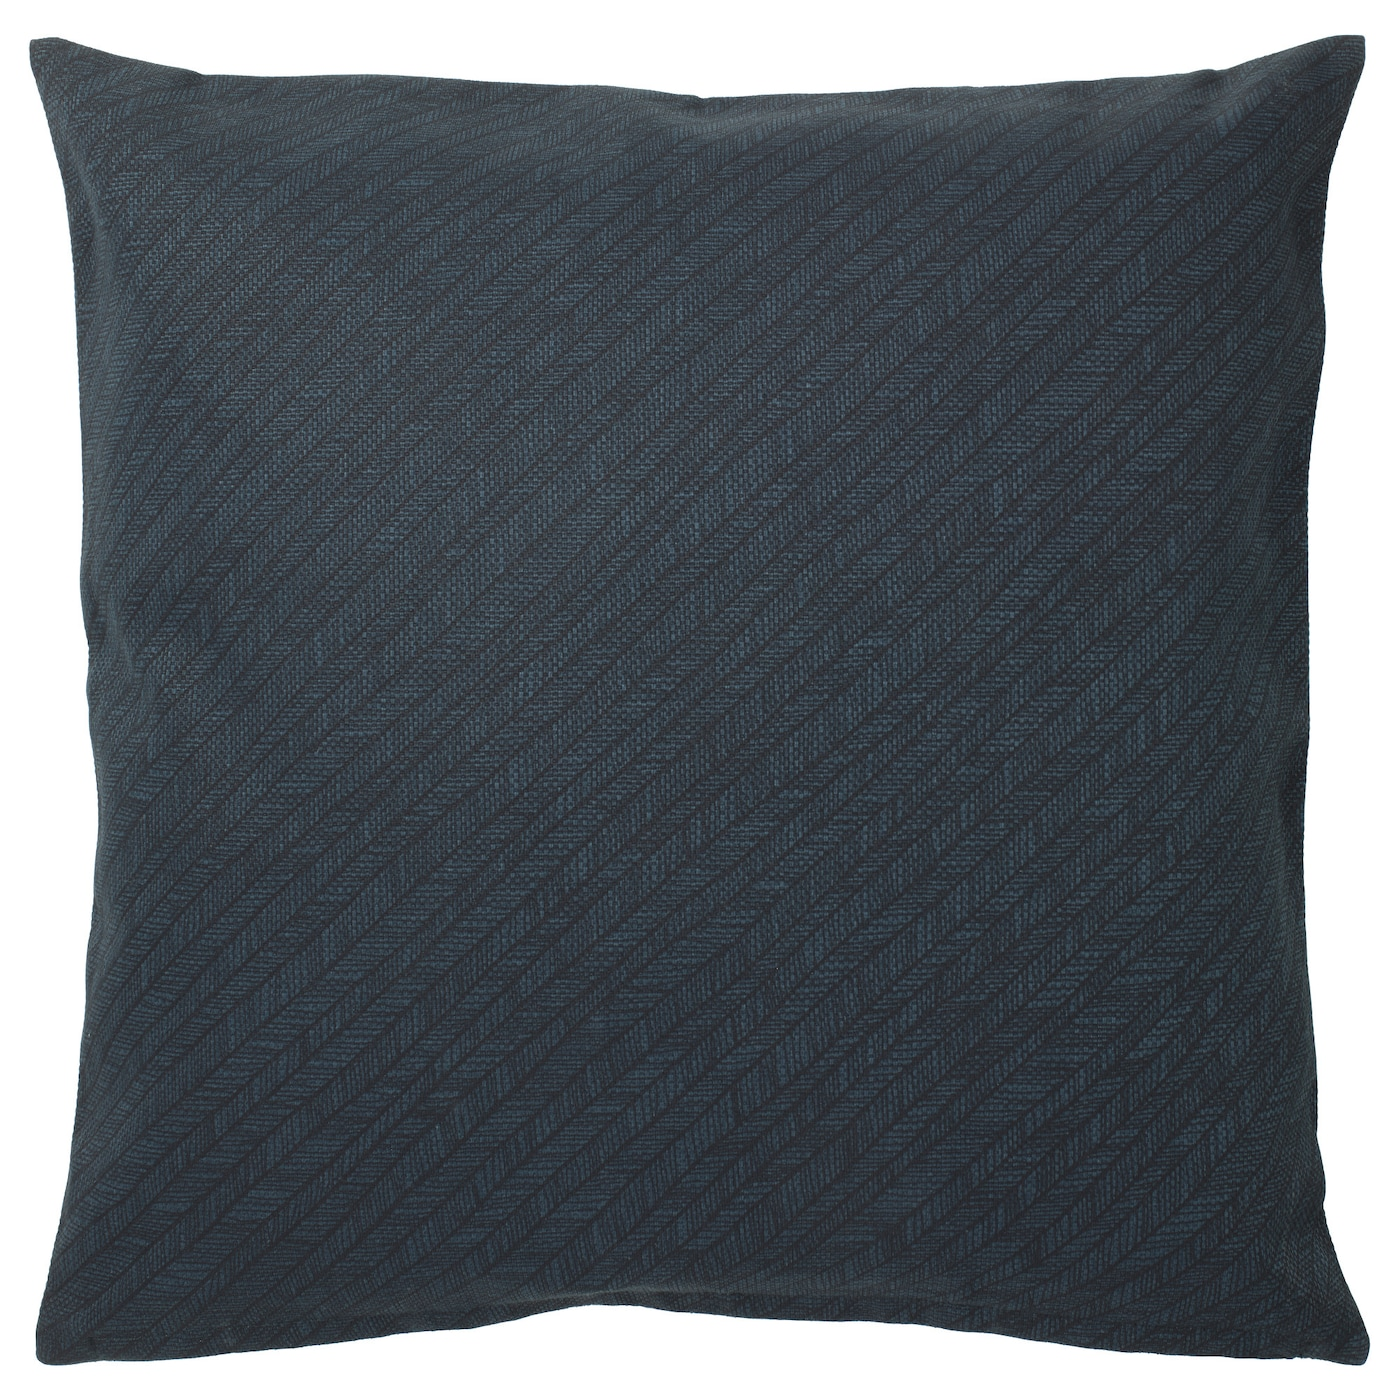 ypperlig housse de coussin bleu fonc ray 50x50 cm ikea. Black Bedroom Furniture Sets. Home Design Ideas